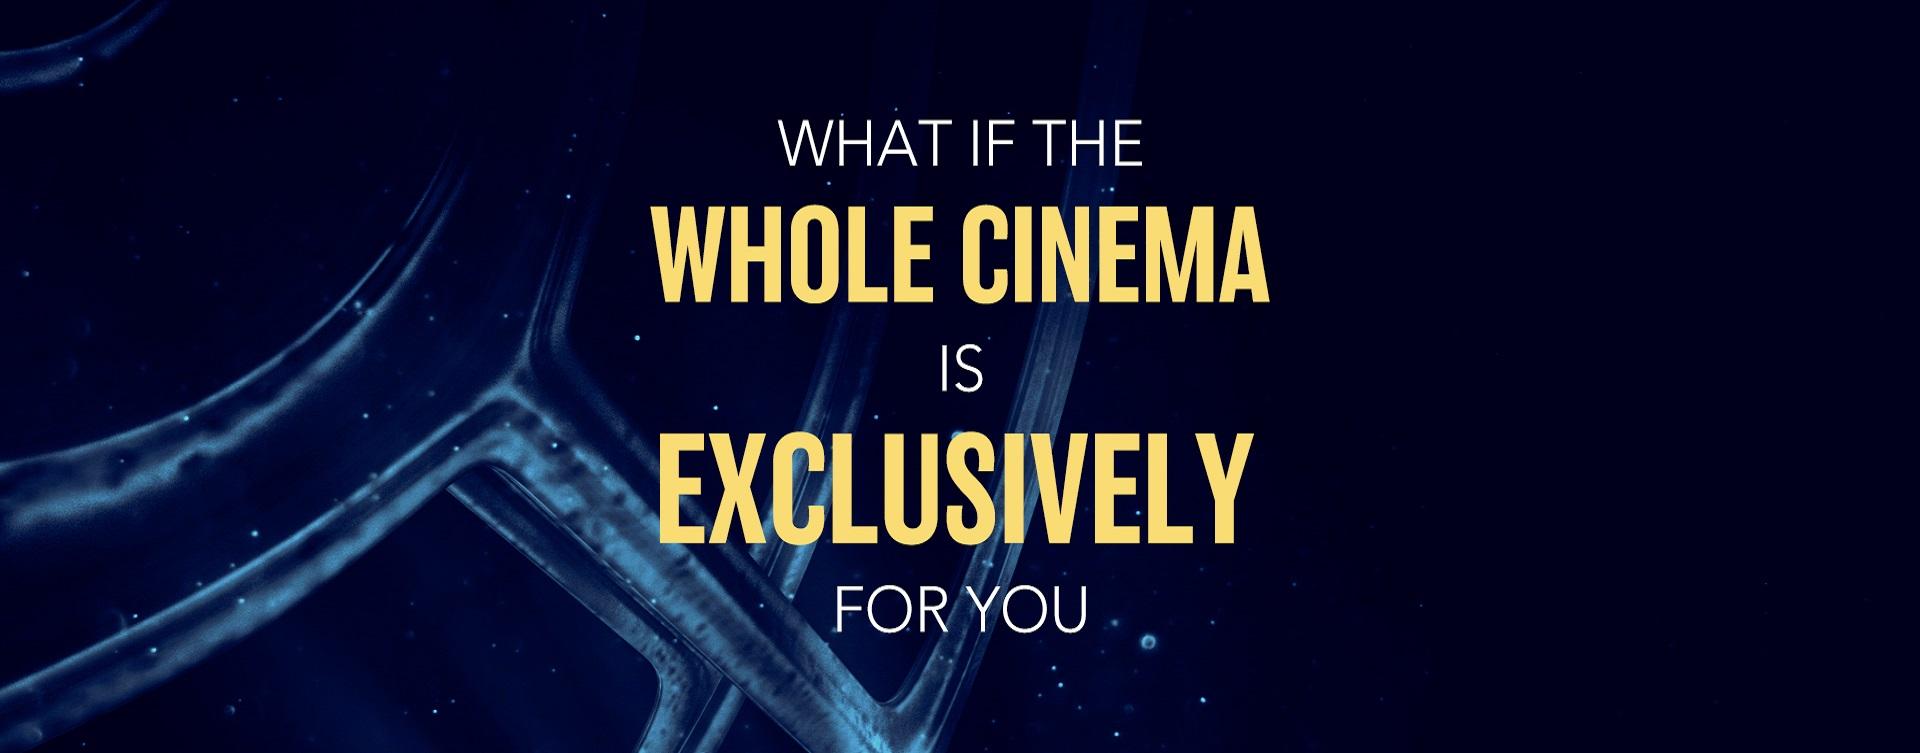 Online Booking Movie Tickets And Movie Times Roxy Cinemas Dubai